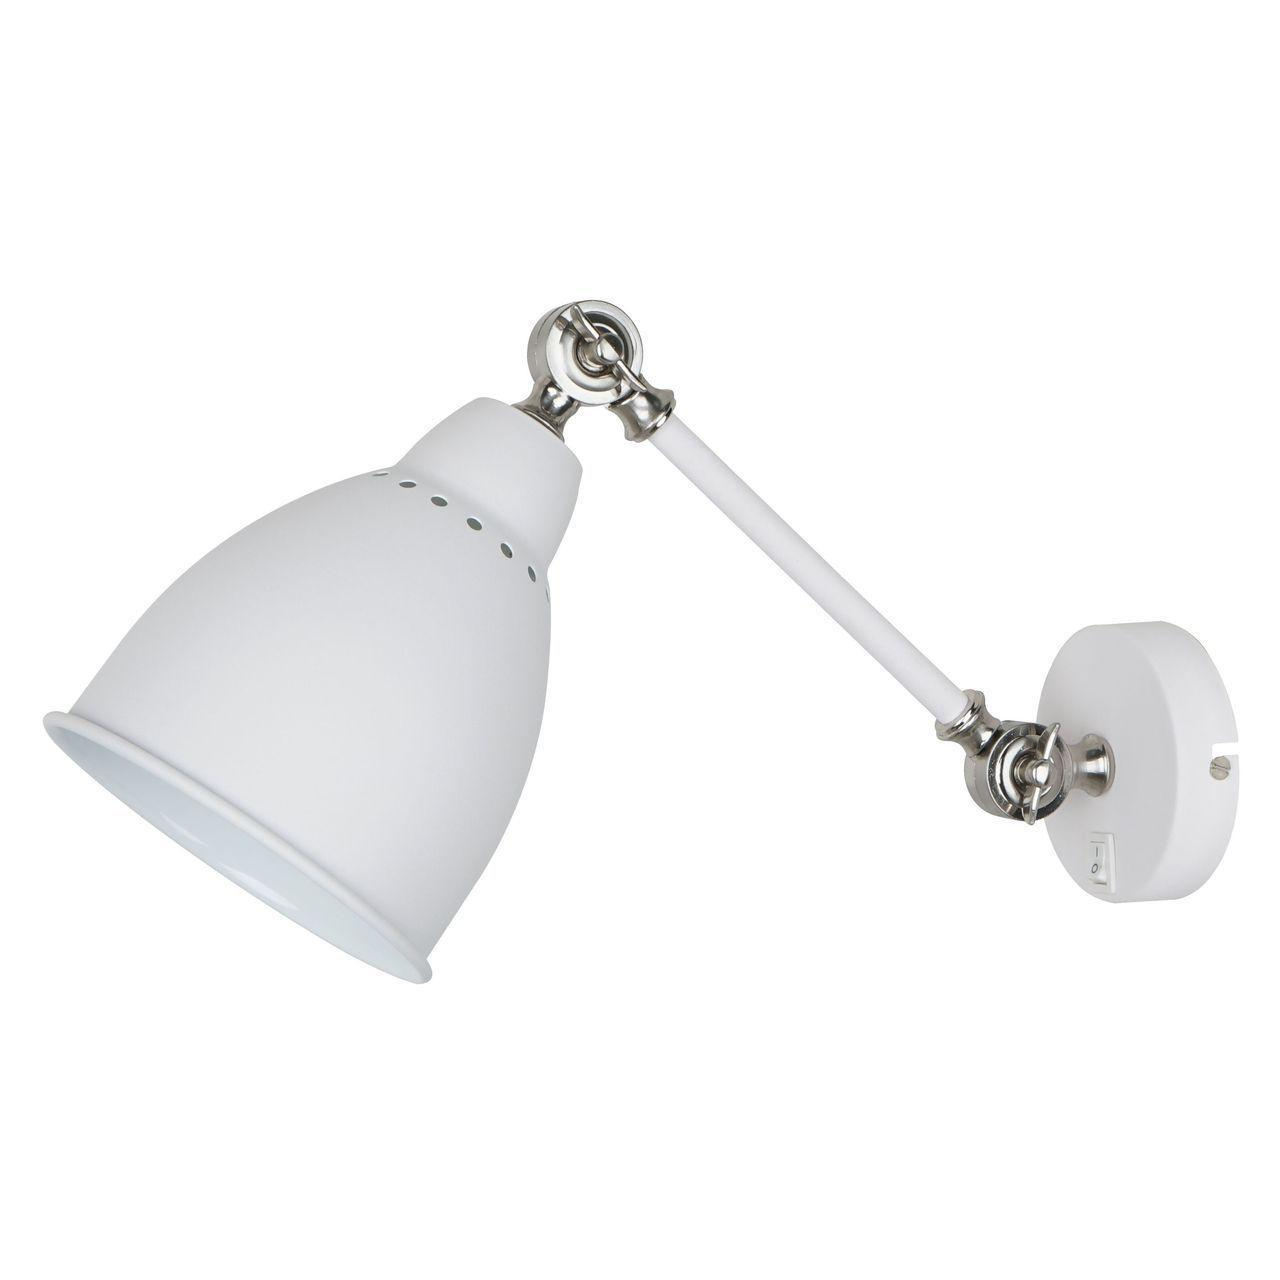 Спот Arte Lamp Braccio A2054AP-1WH бра arte lamp braccio a2054ap 1bk